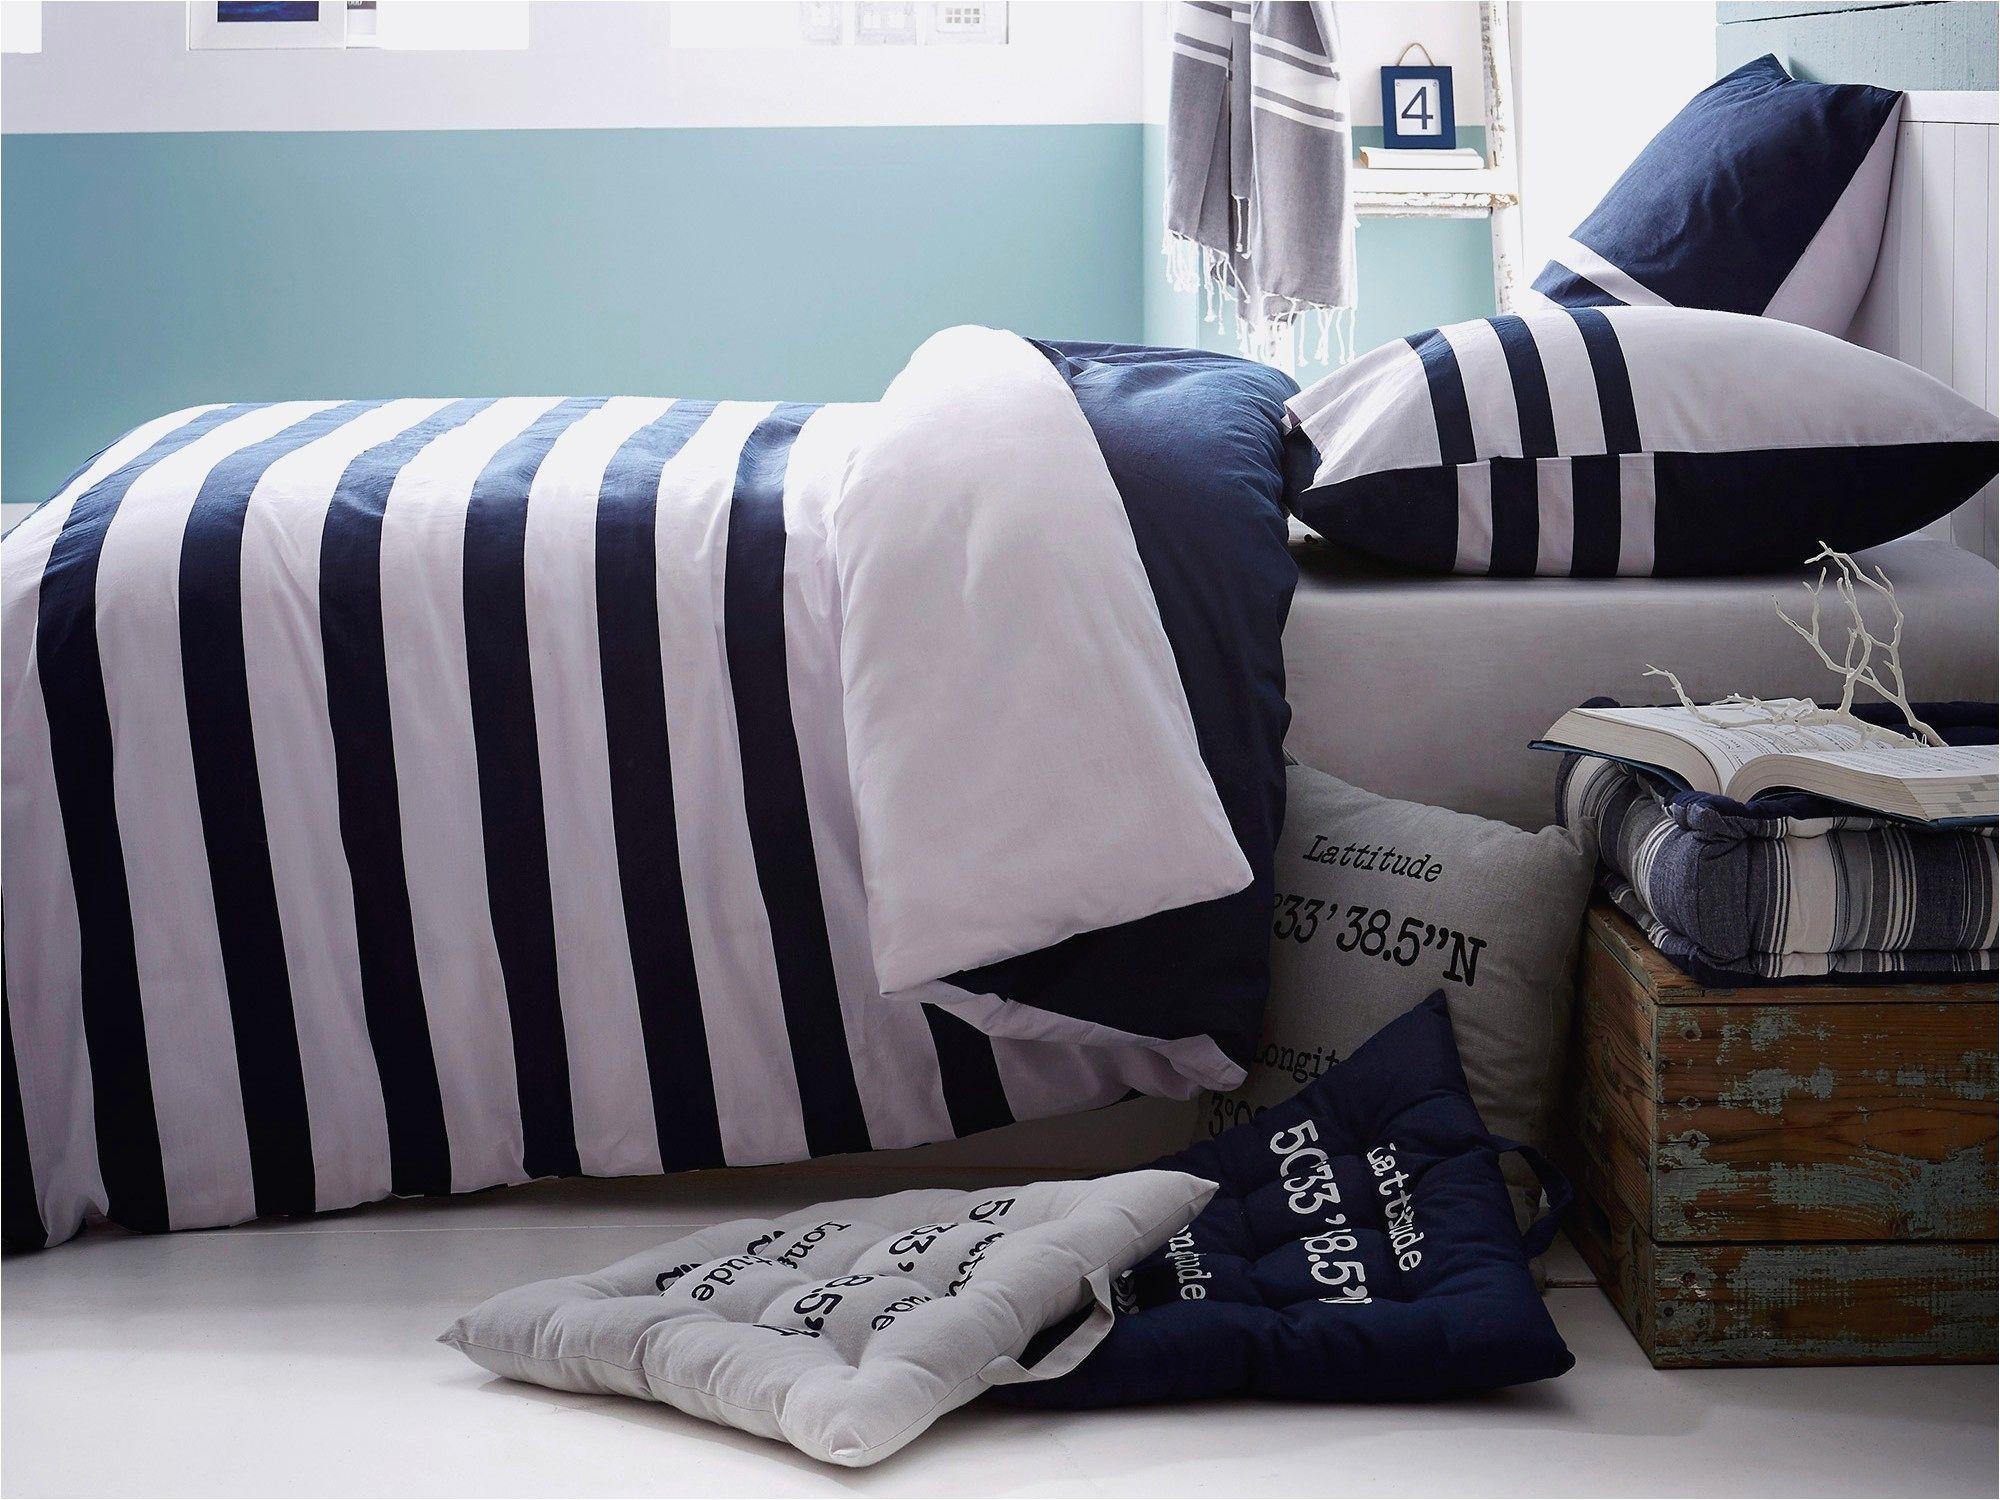 Ikea Housse De Couette Ikea Housse De Couette Ofelia Vass Housse De Couette Et 2 Taies Ikea Ikea Ofelia Vass Housse De Couette Et 2 T Pillows Bed Bed Pillows